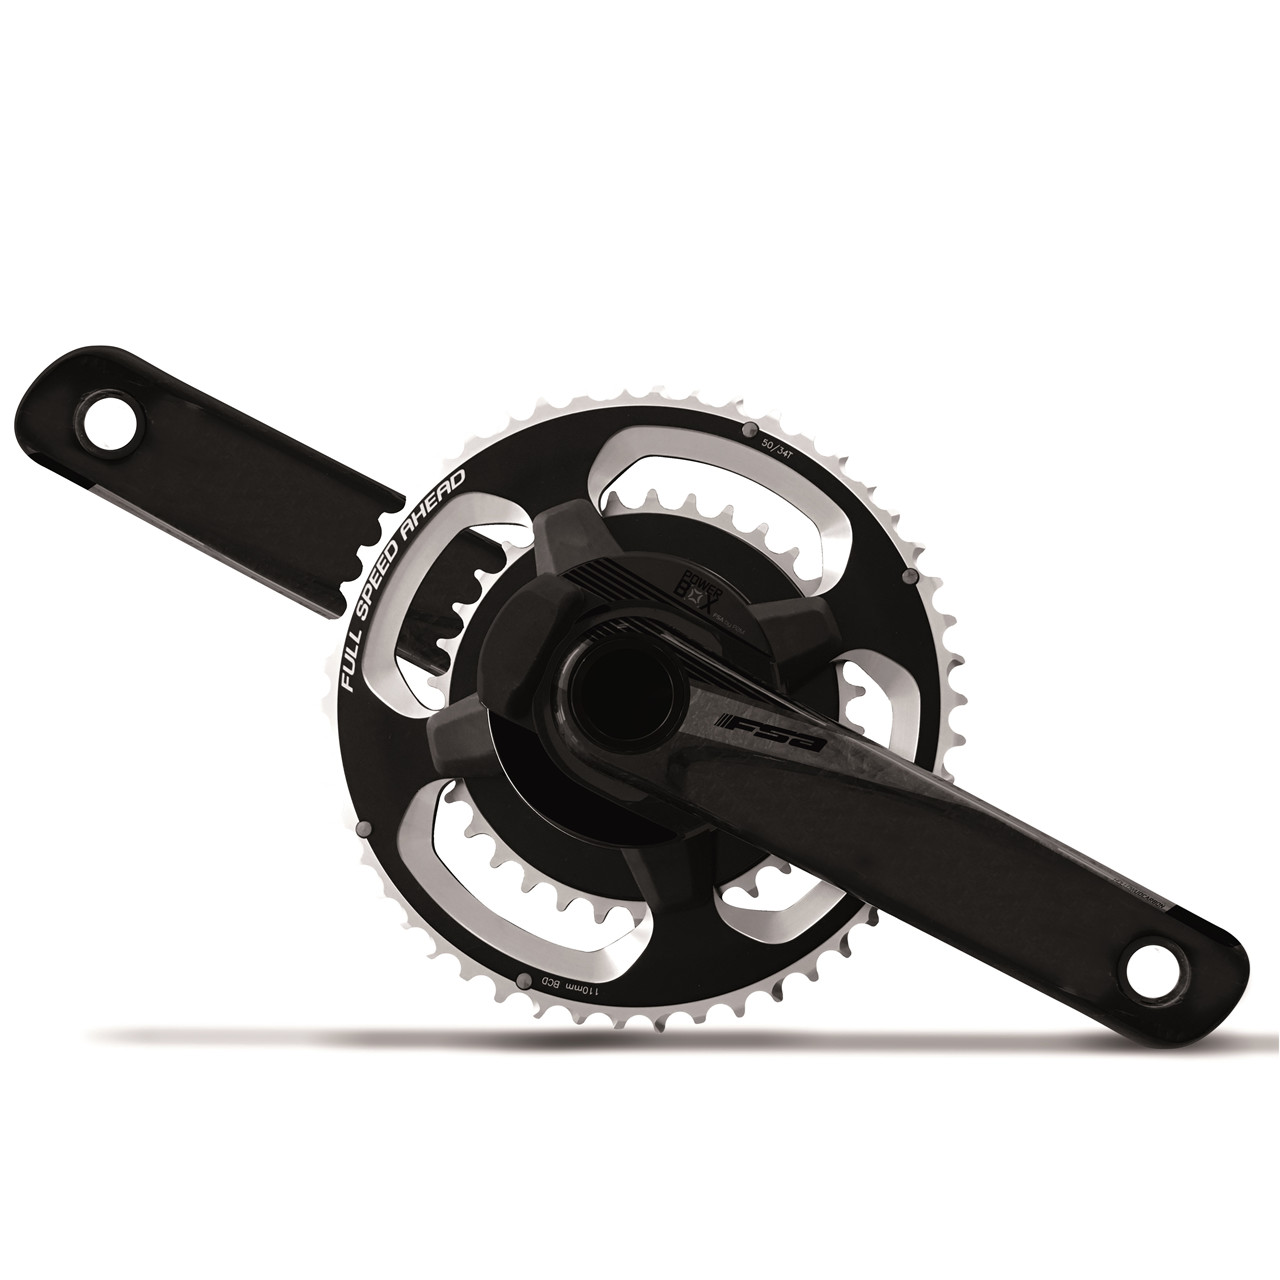 Cykler Fsa Powerbox Bb386 Carbon (165Mm, 53/39T) Cykel Tilbehør